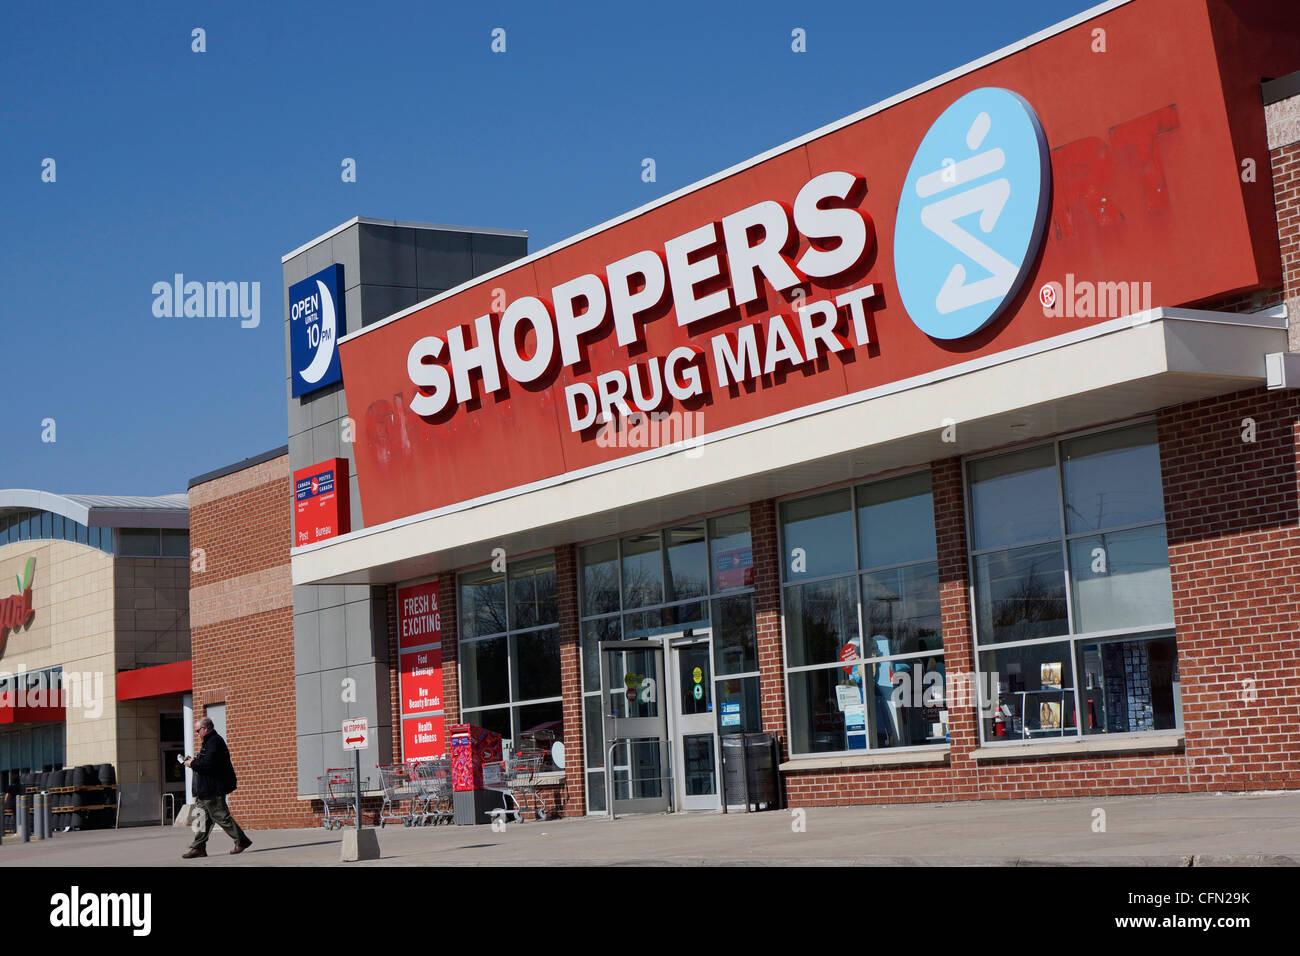 Shoppers Drug Mart farmaco Retail Store Immagini Stock